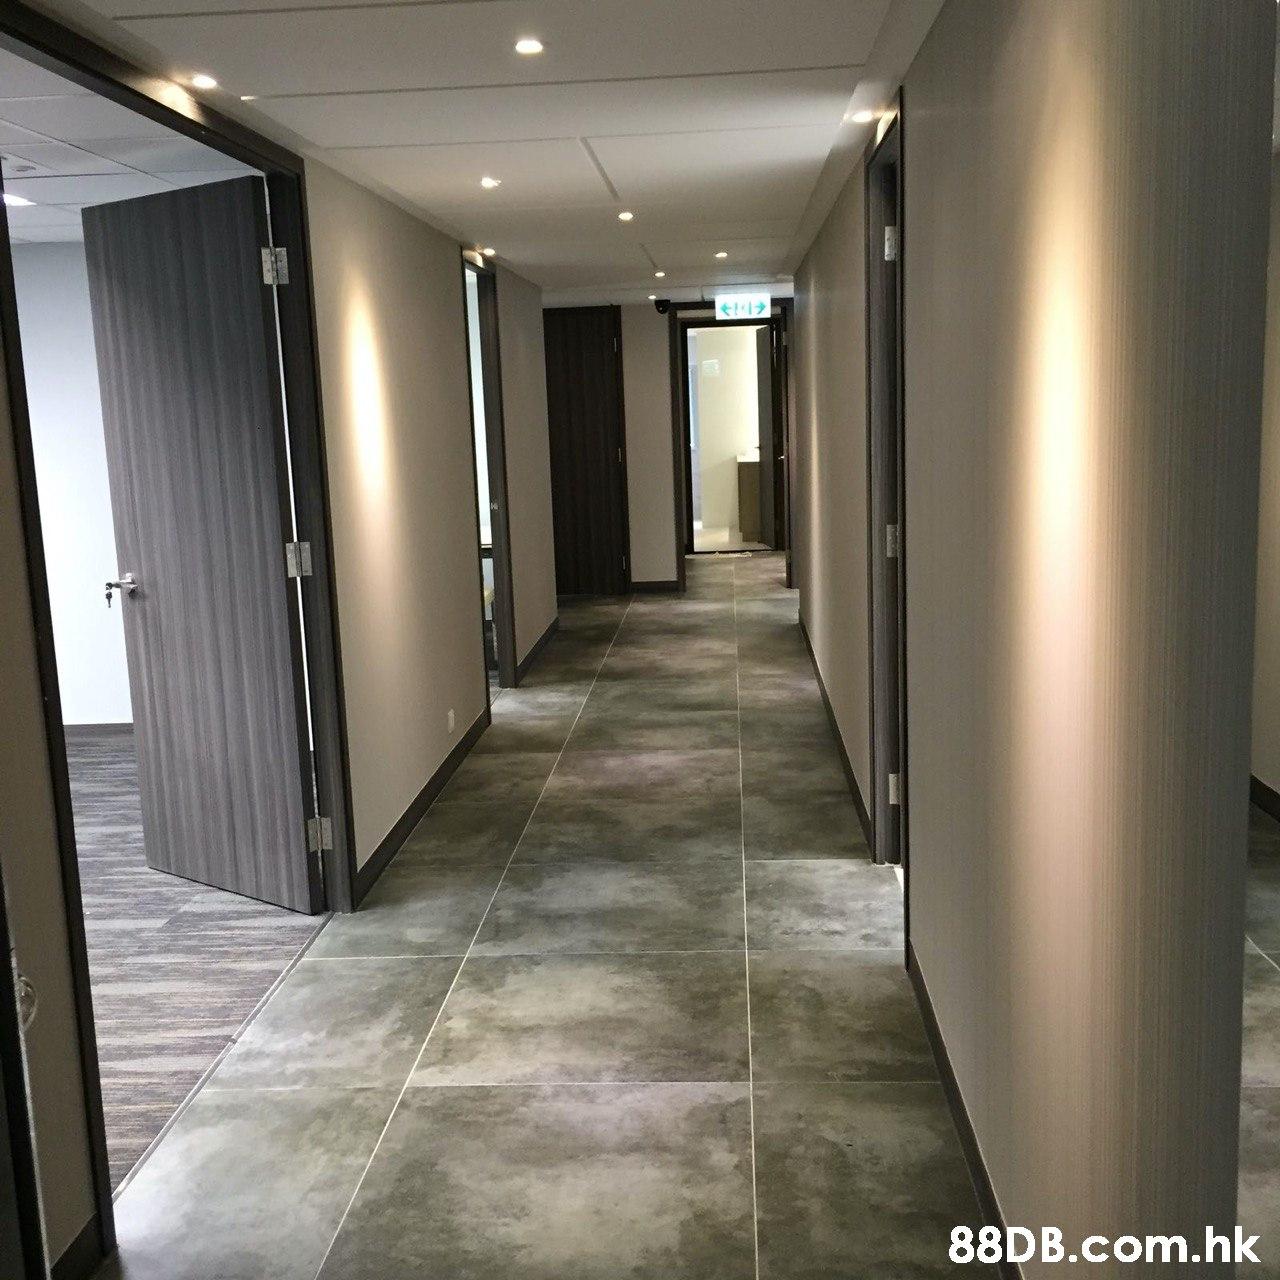 .hk  Property,Building,Floor,Ceiling,Room